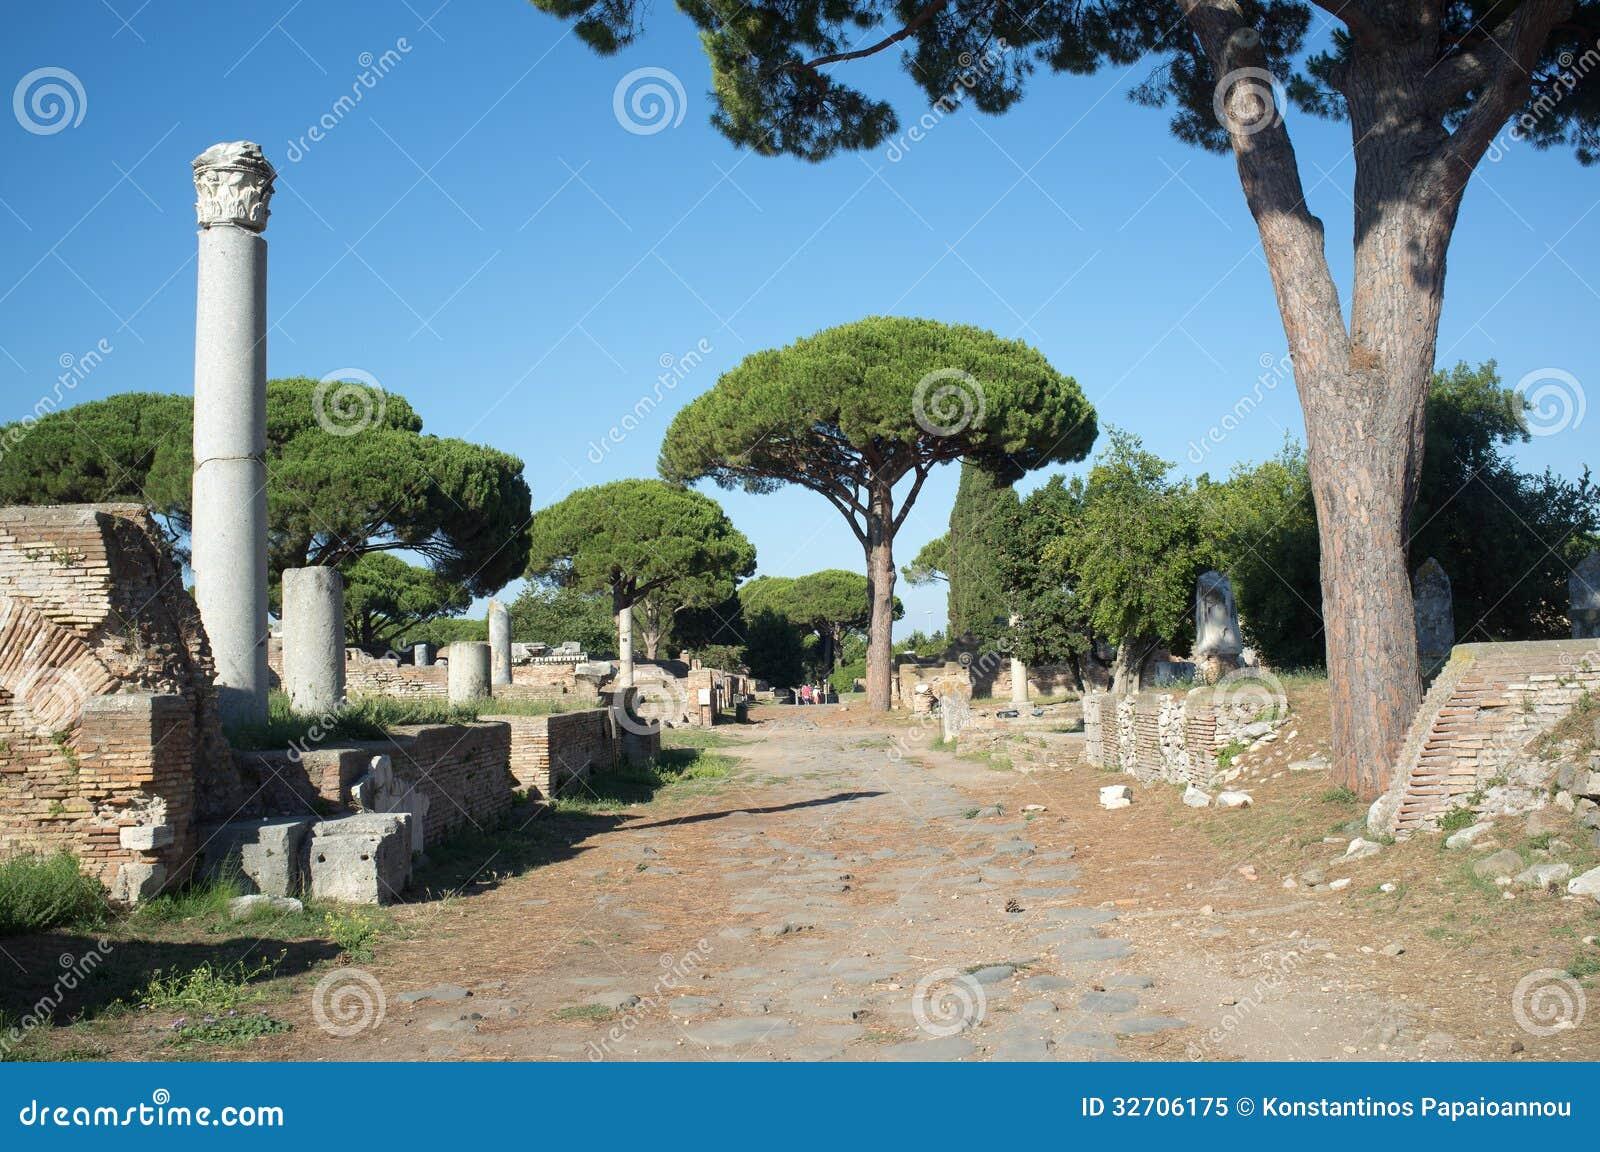 Ostia antica in rome royalty free stock photo image for Mr arredamenti ostia antica